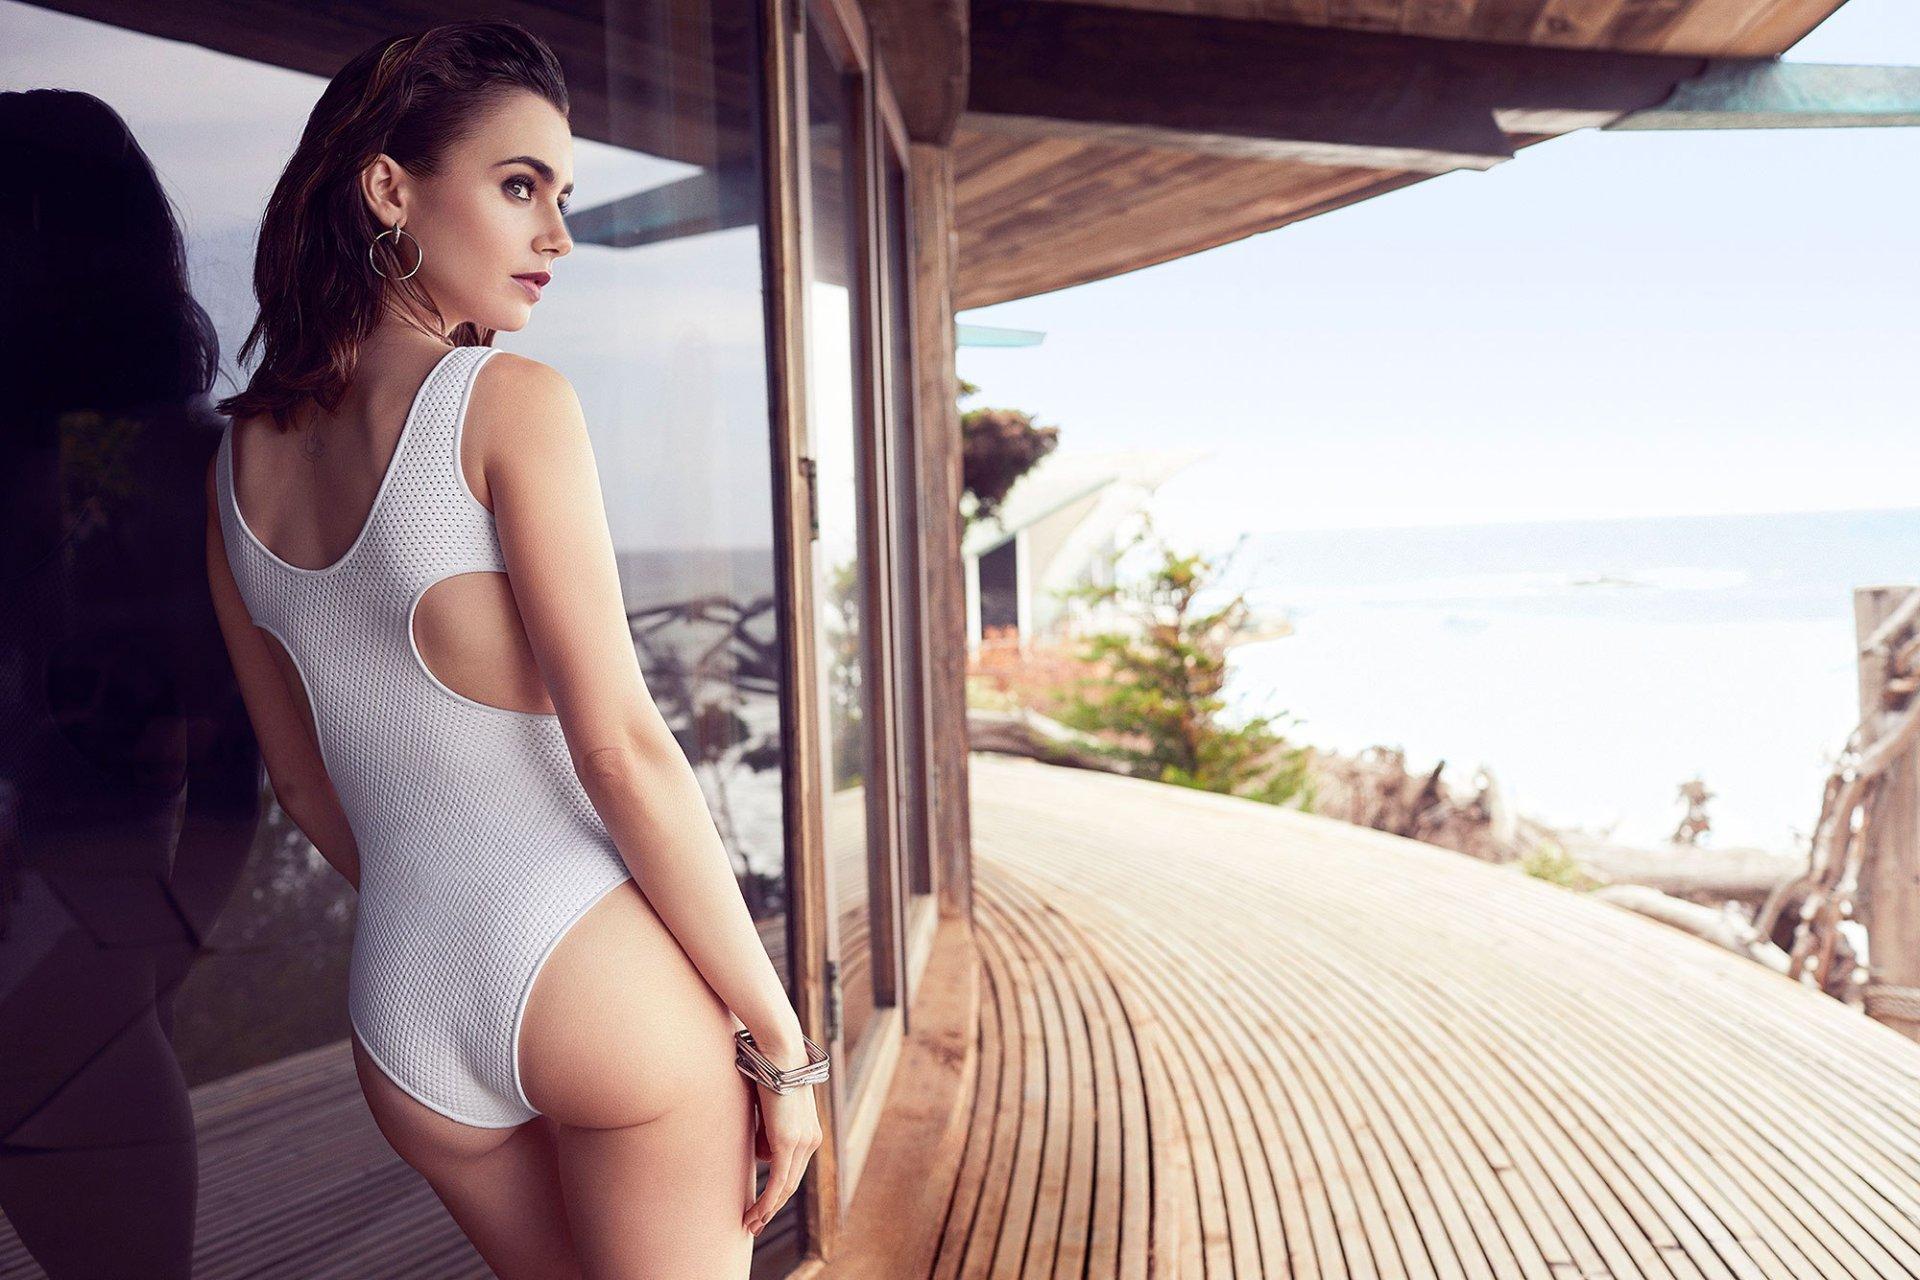 Lily collins caliente porno